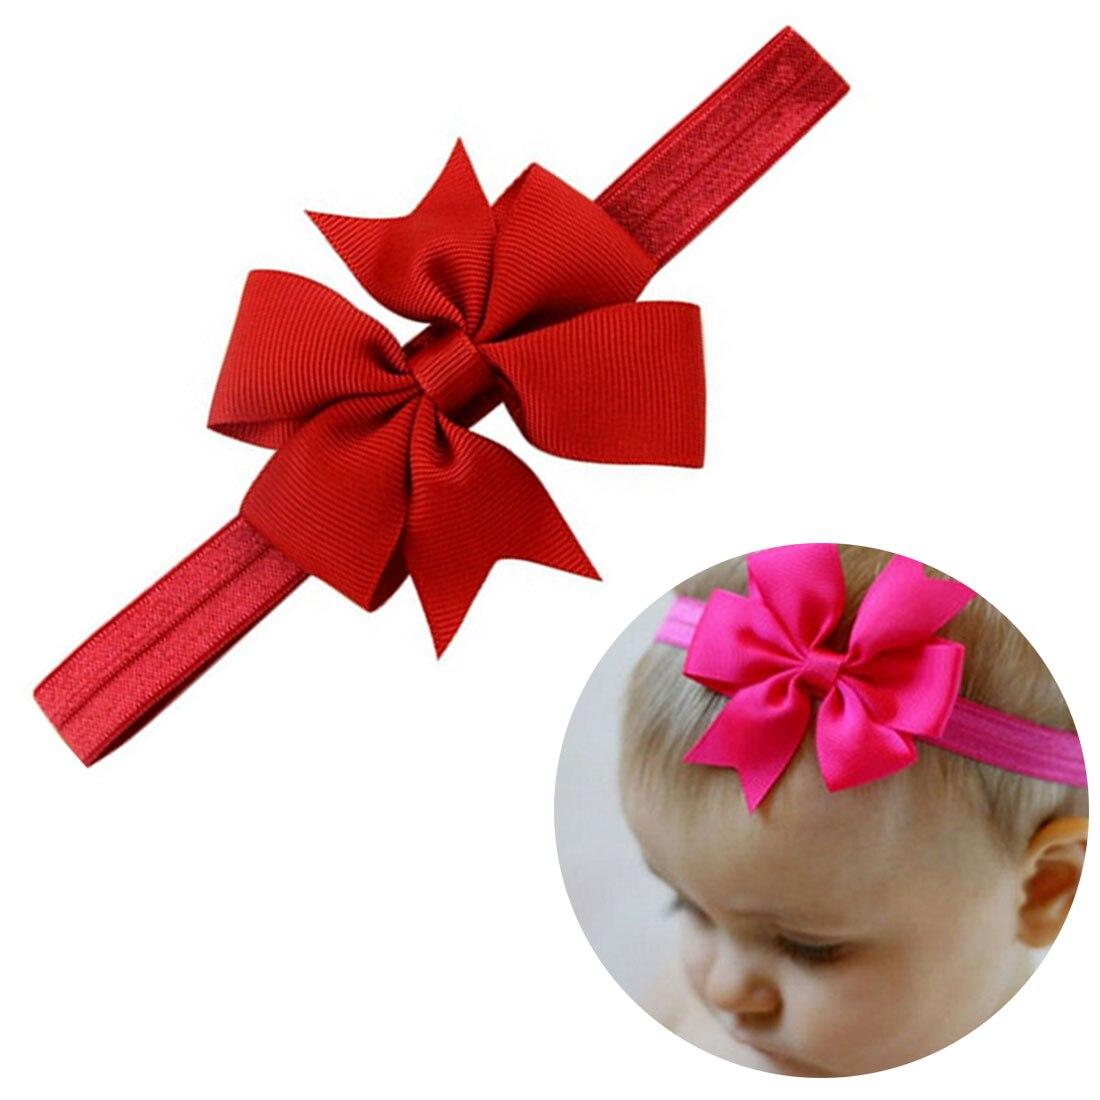 Baby Kids Girls Rabbit Bow Ear Hairband Headband Turban Knot Head Wraps Cotton Blends Unisex Hairband